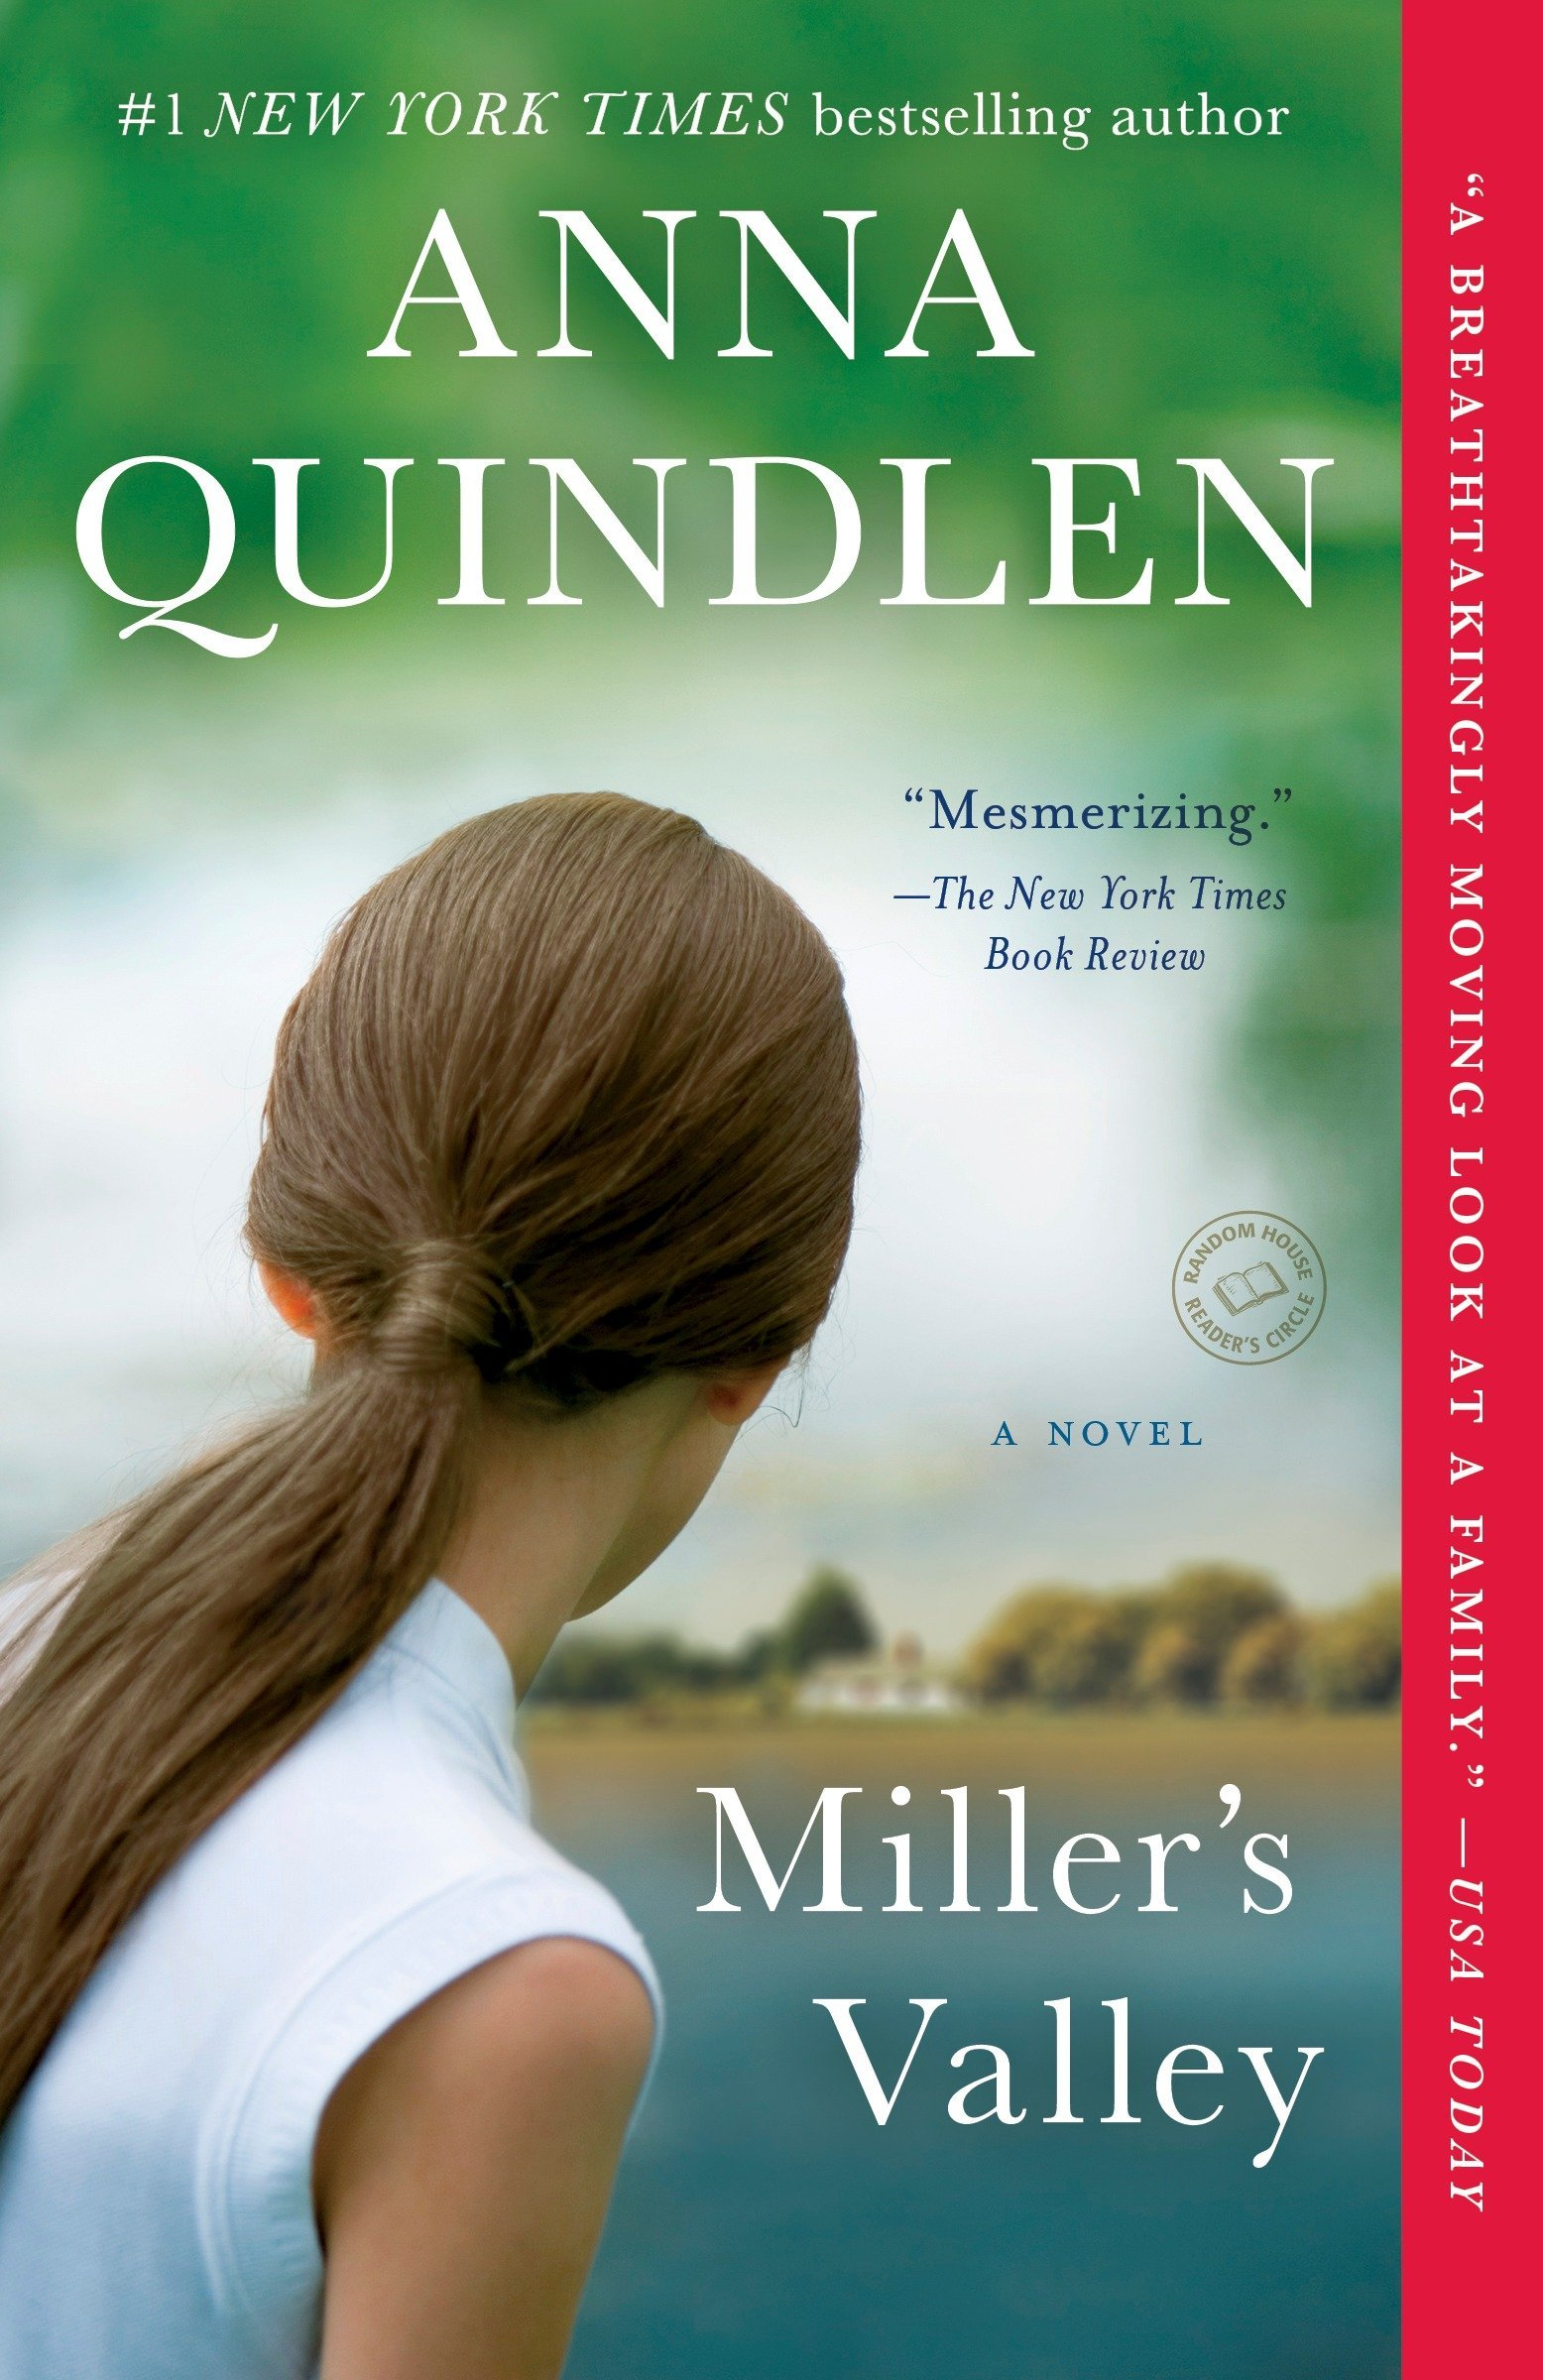 Evening Book Group - Miller's Valleyby Anna Quindlen